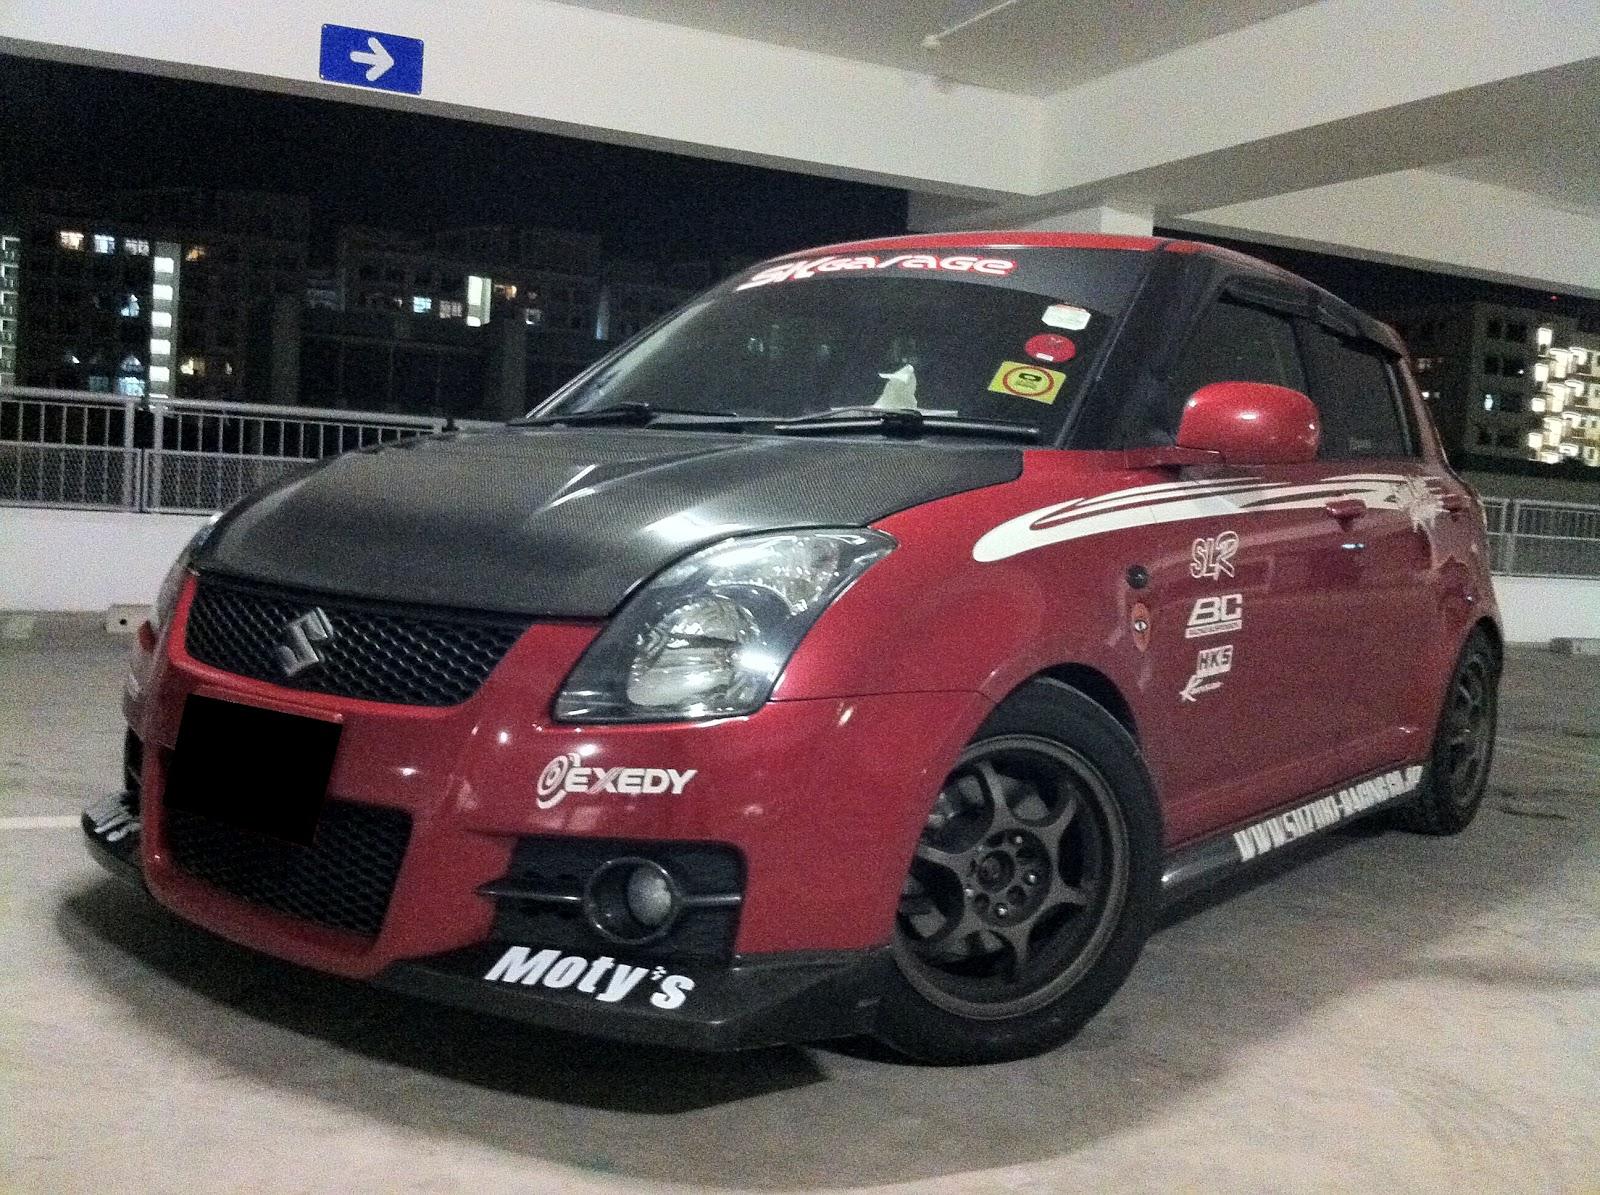 The Suzuki Swift Sport Ltd Edition Sunline Racing Theme